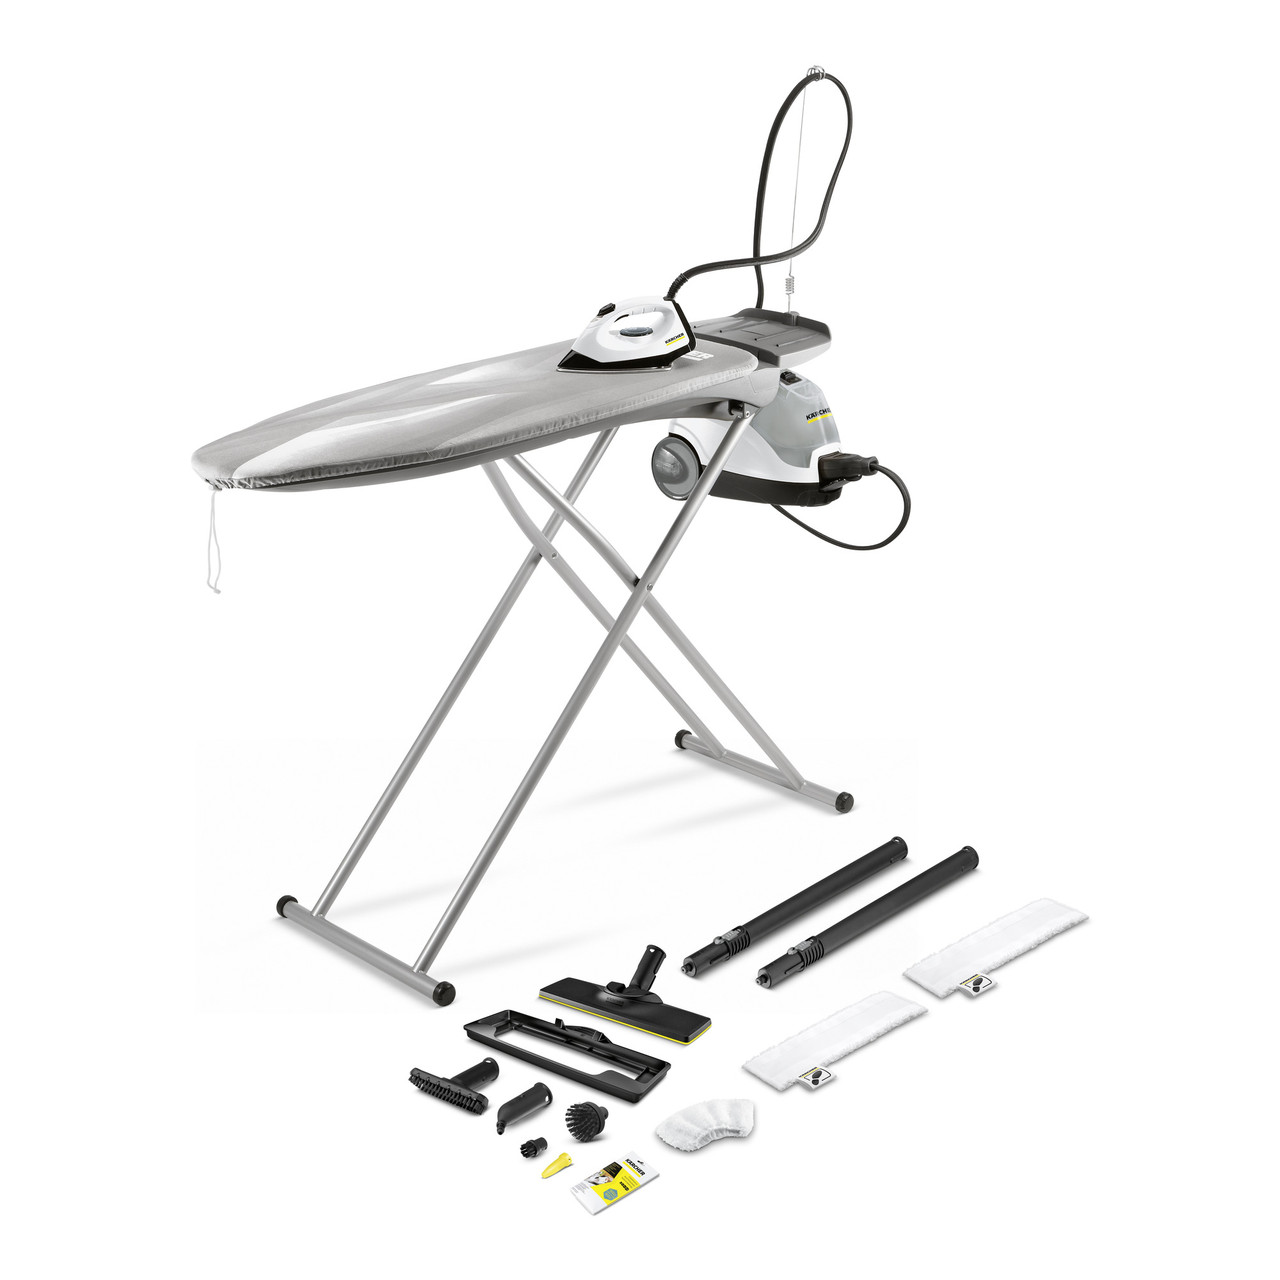 Паровая гладильная станция Karcher SI 4 EasyFix Premium Iron d819365e8909c